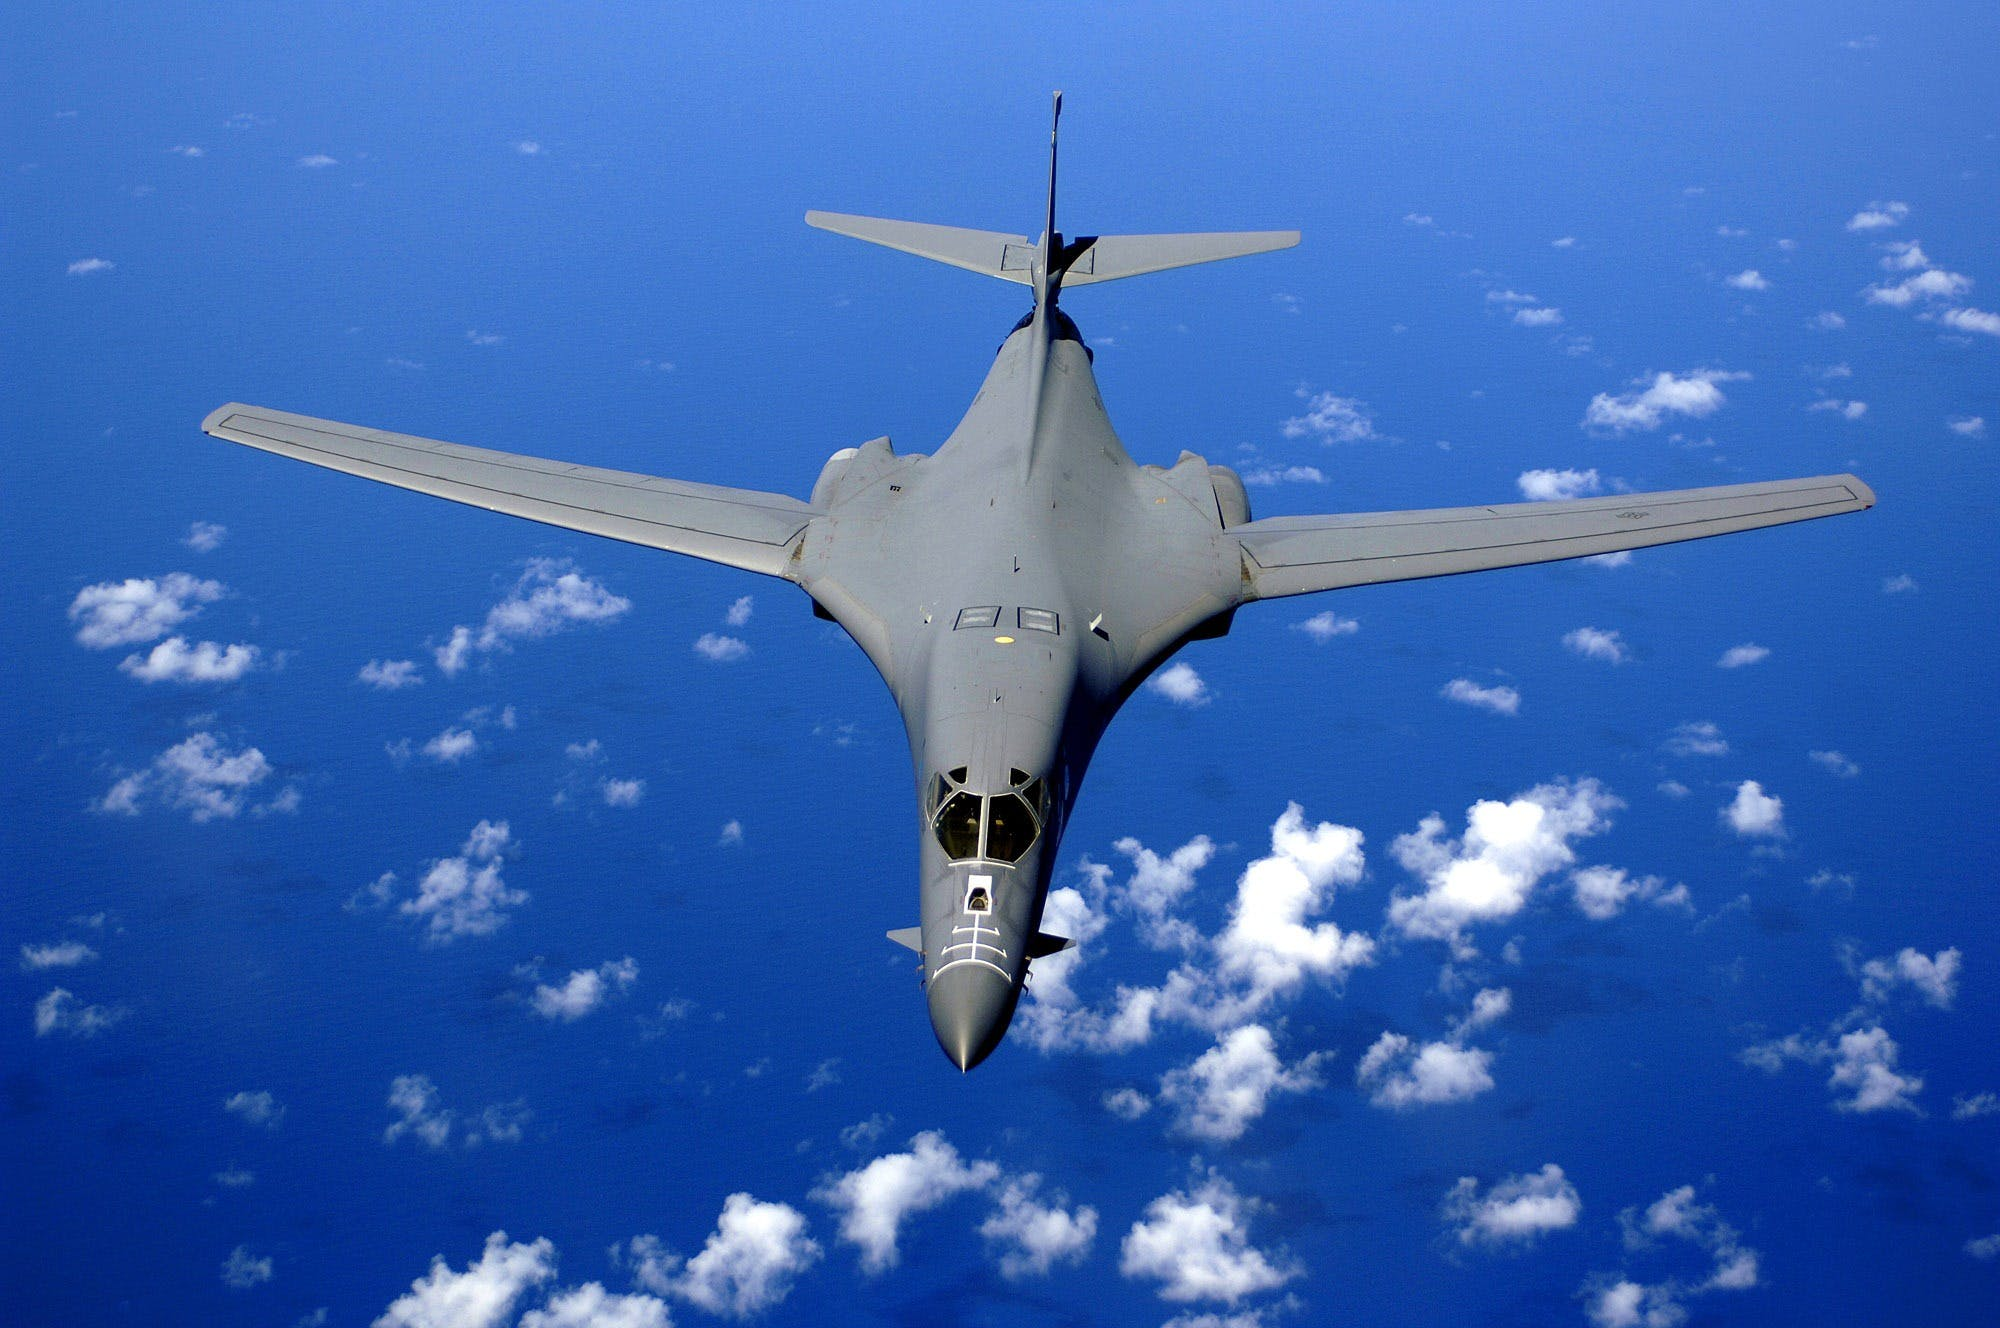 Black Fighter Jet Near White Clouds